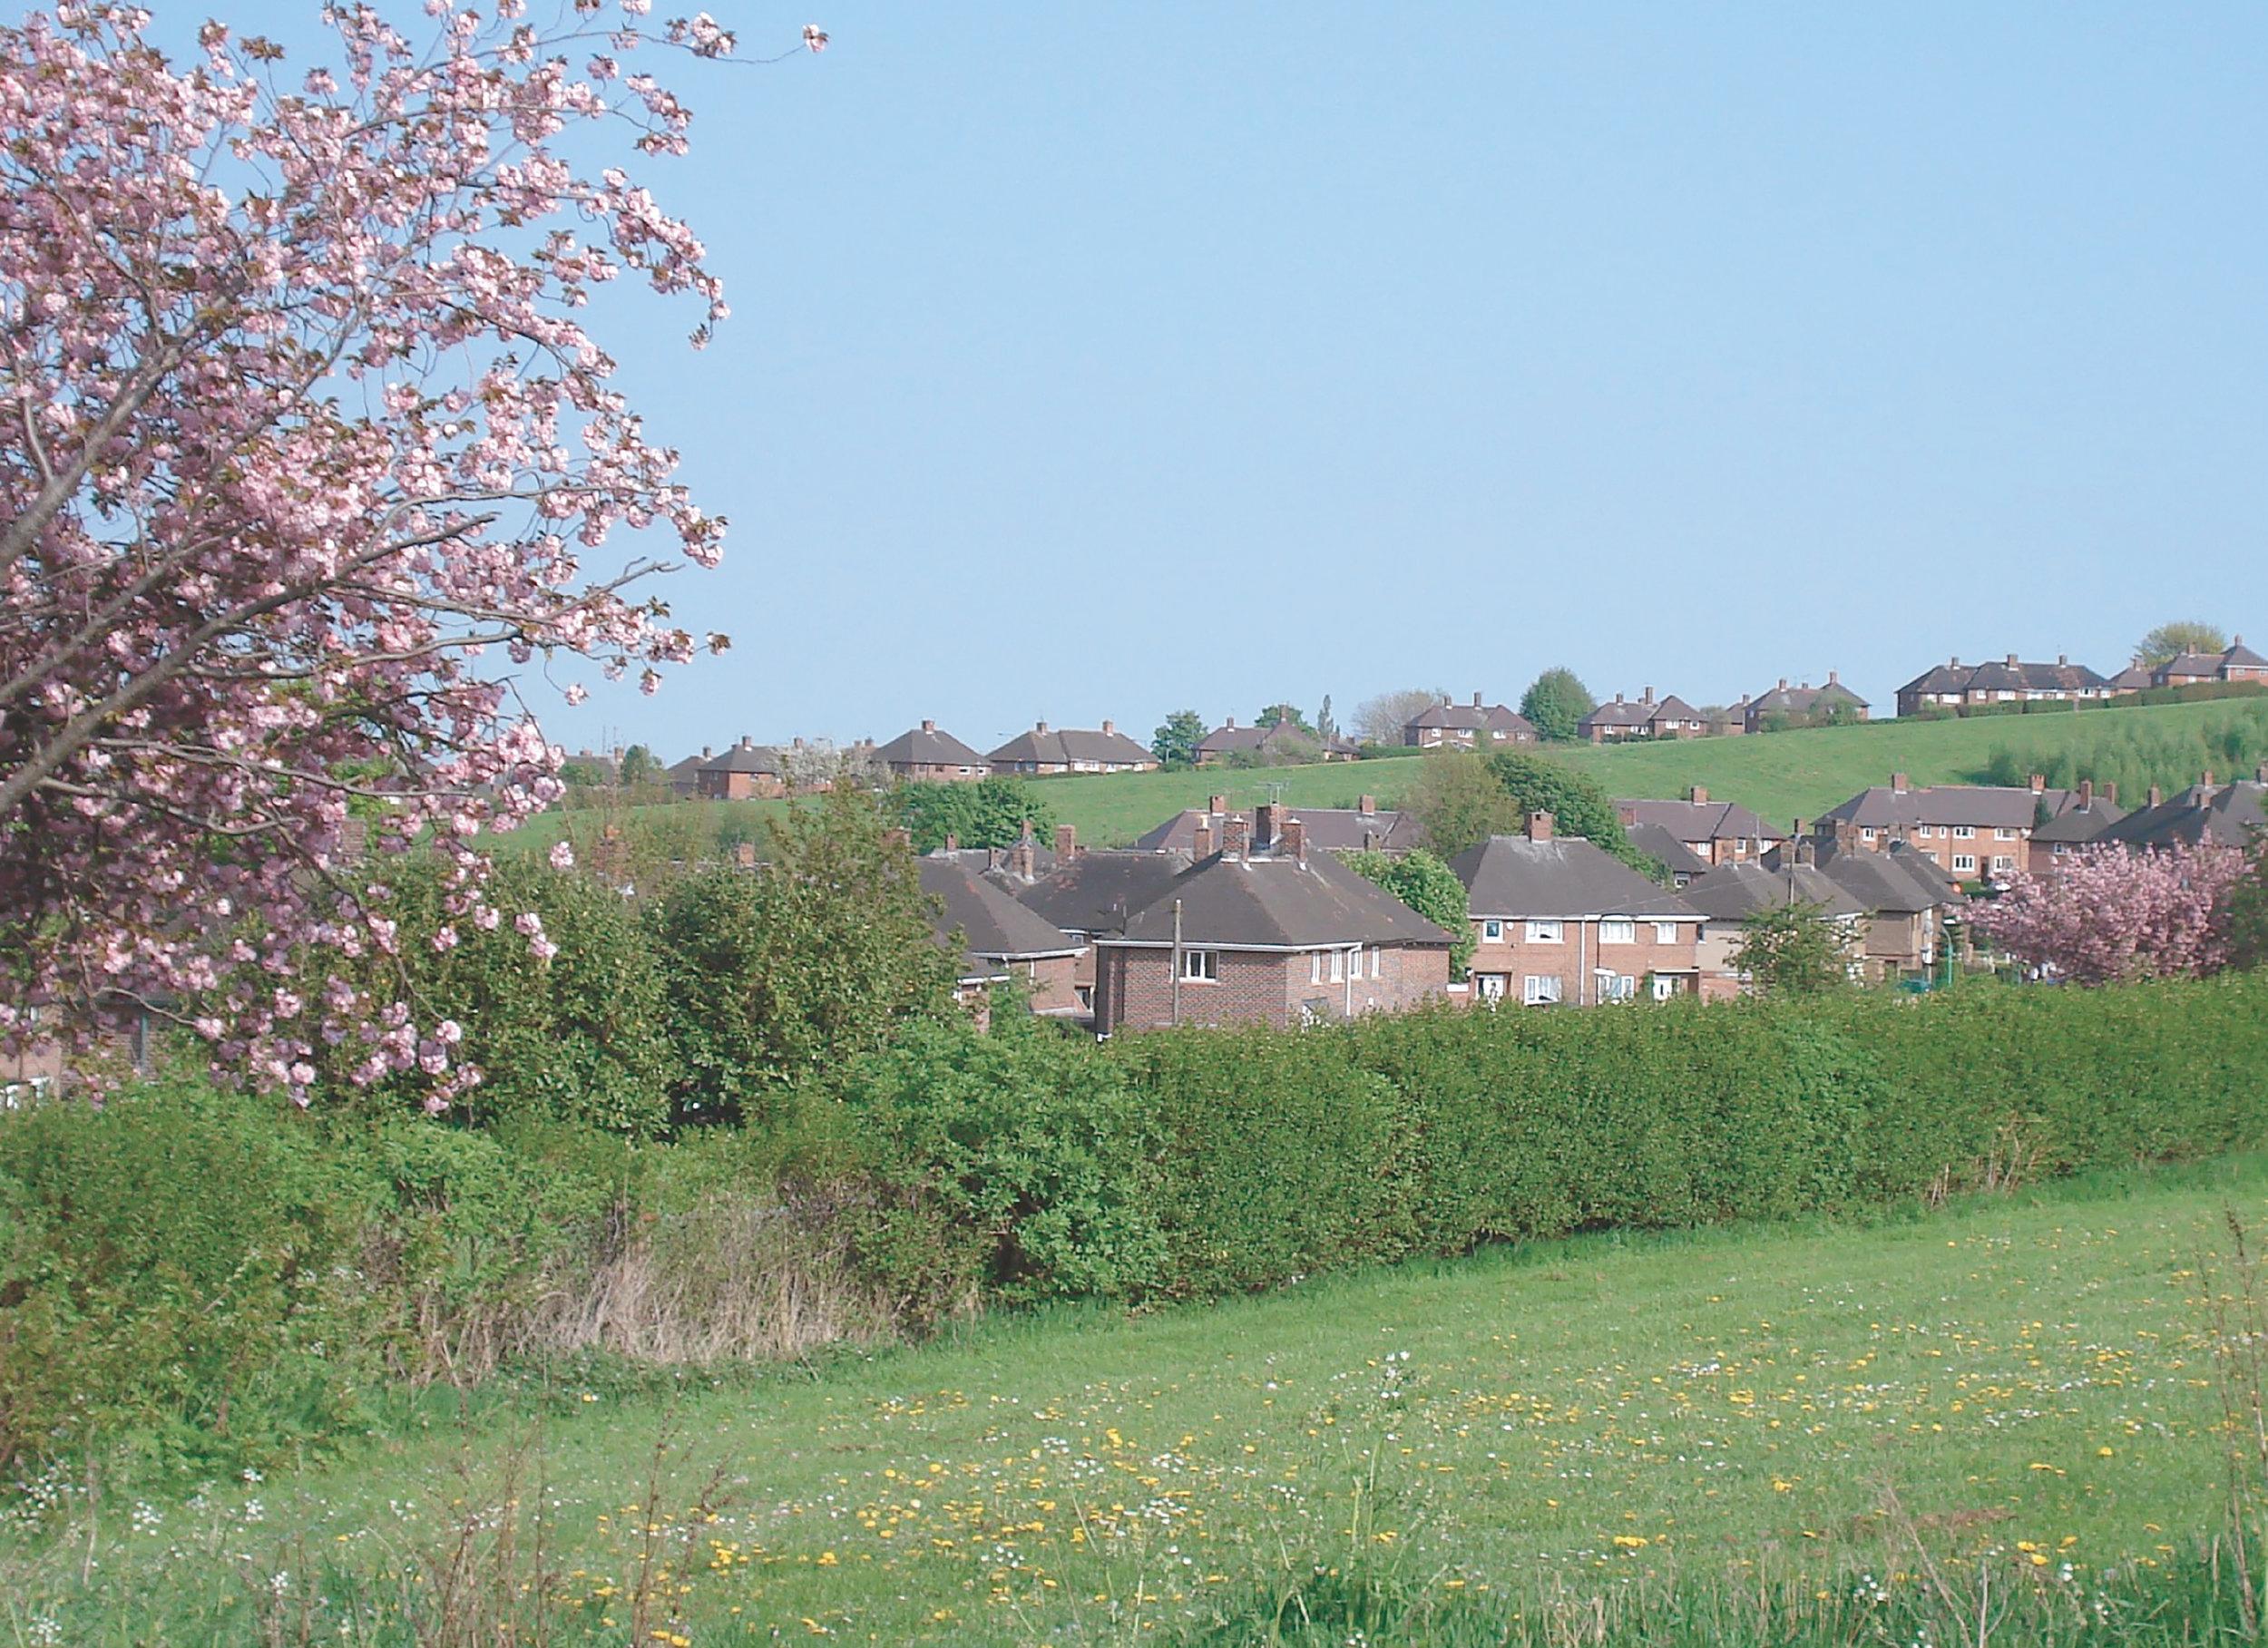 LandscapePart2CoverPhoto.jpg